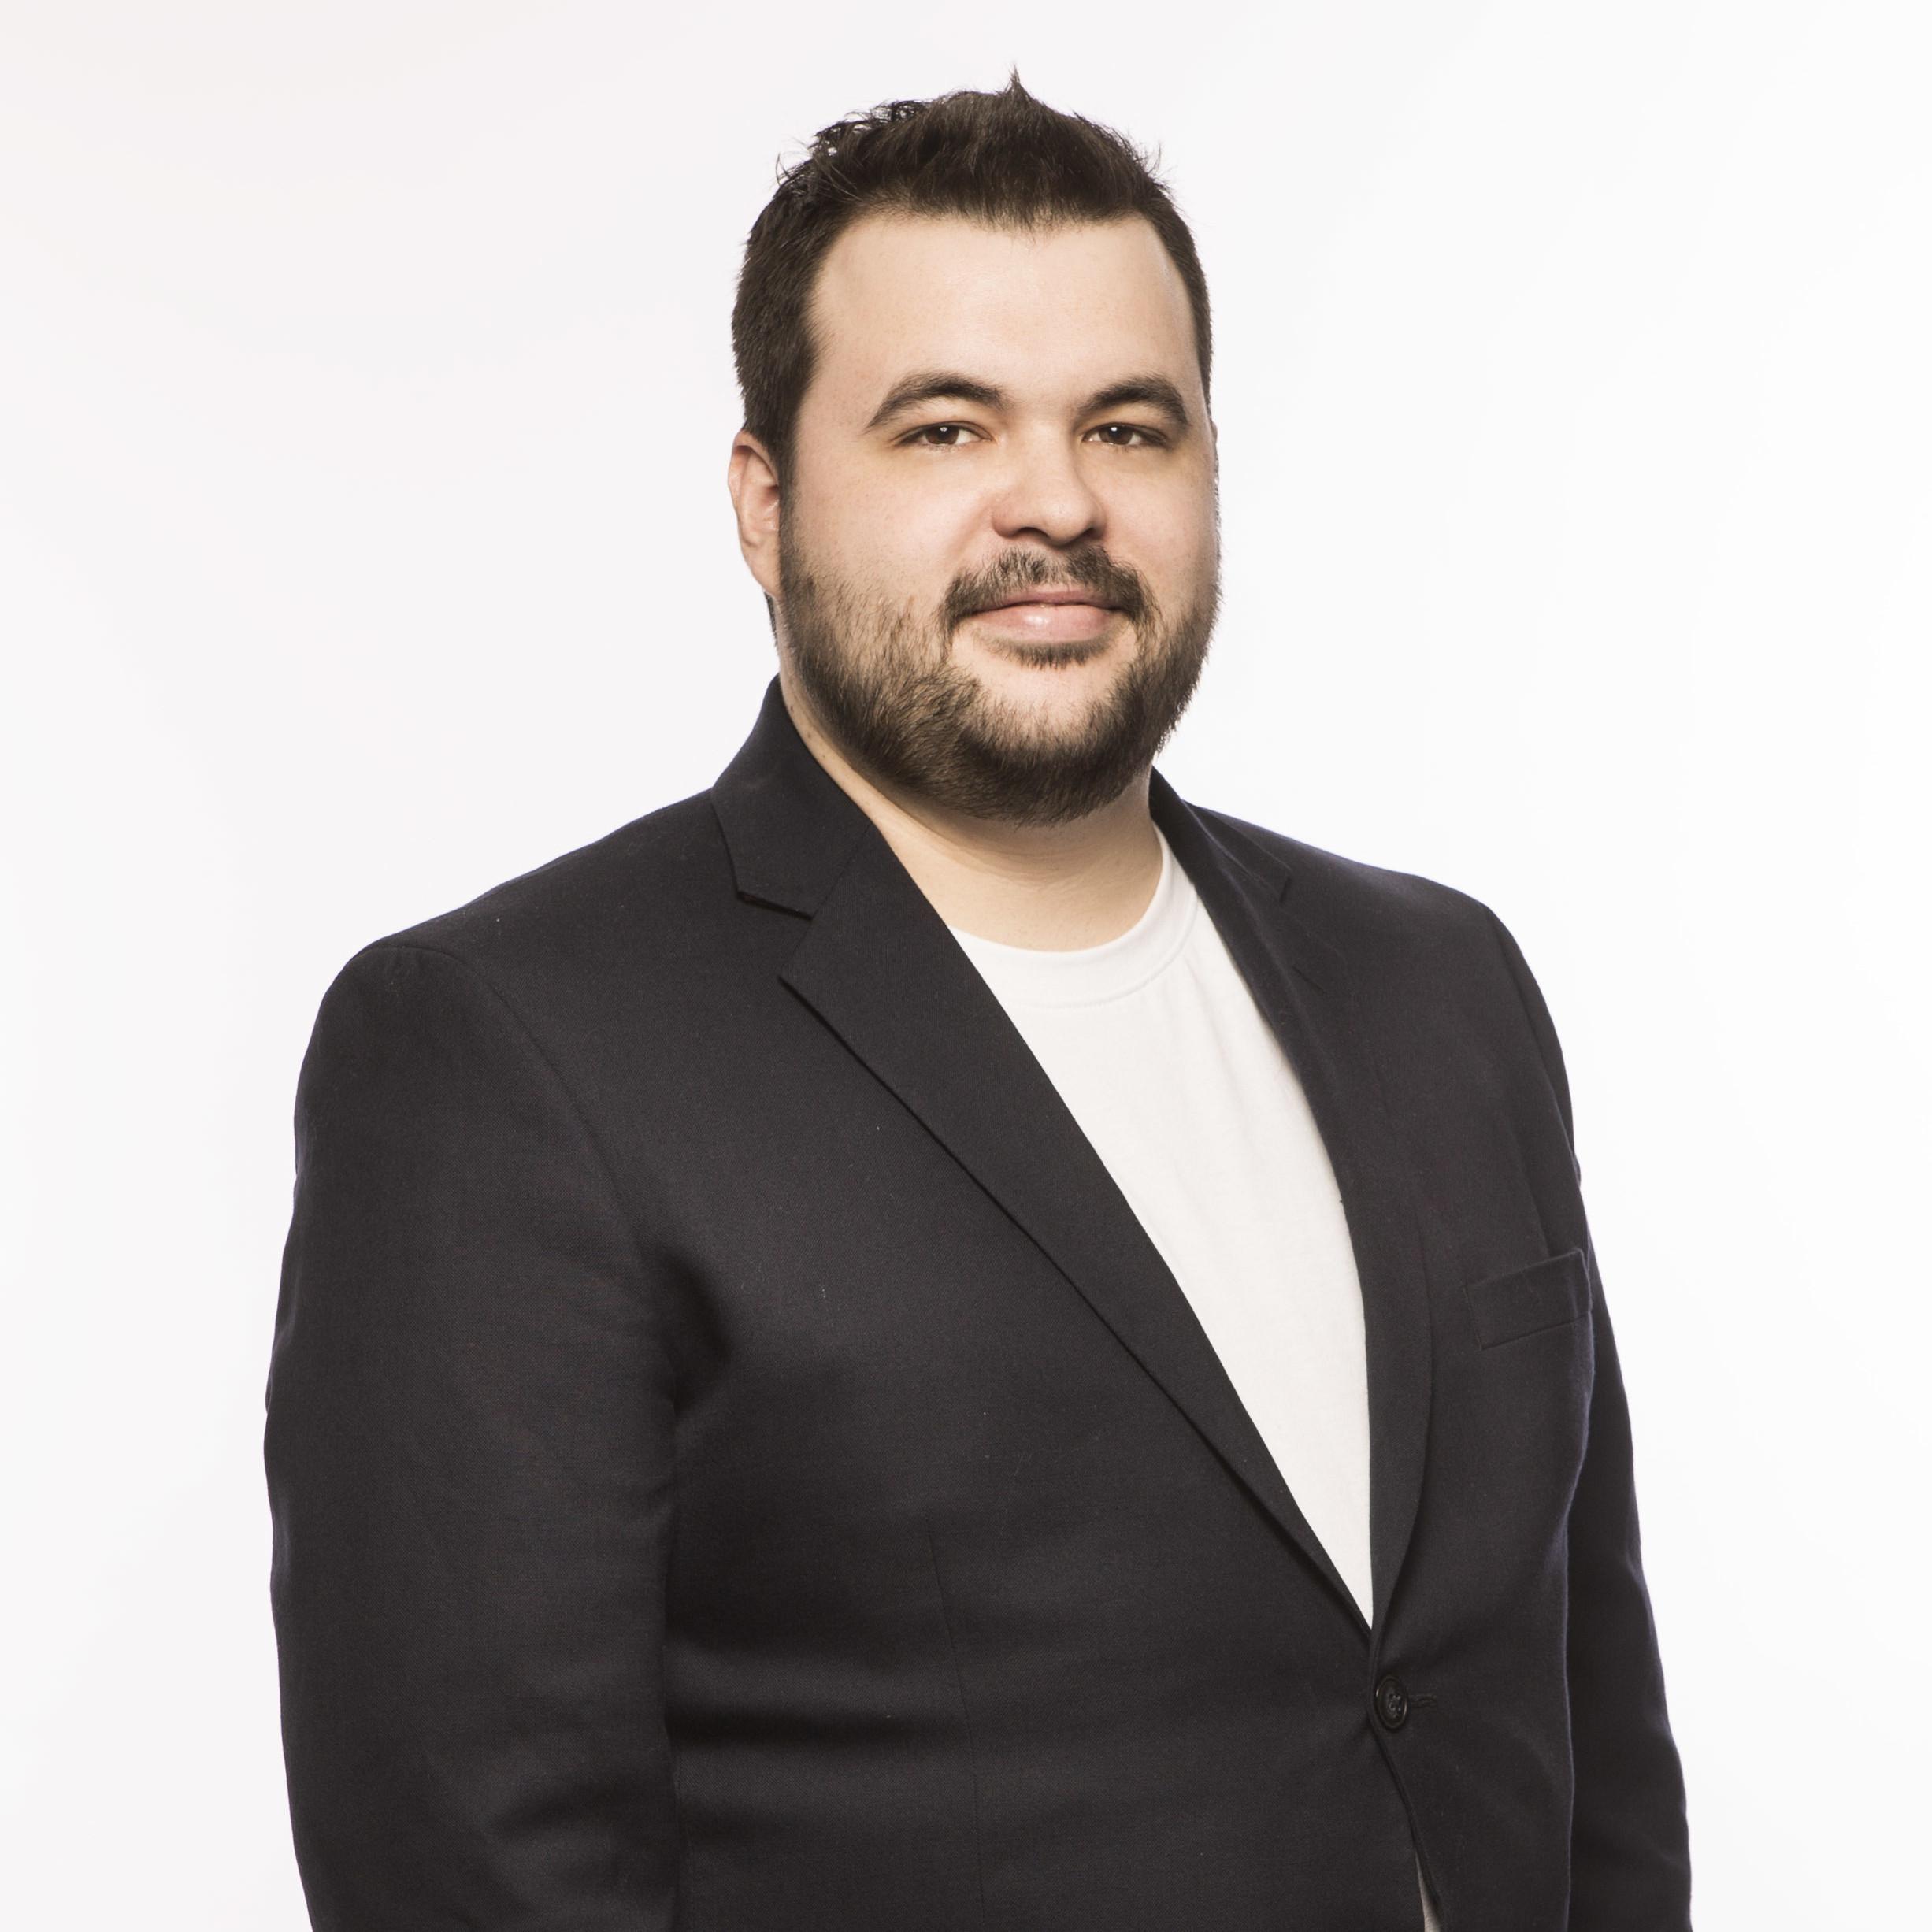 Maxime Simard